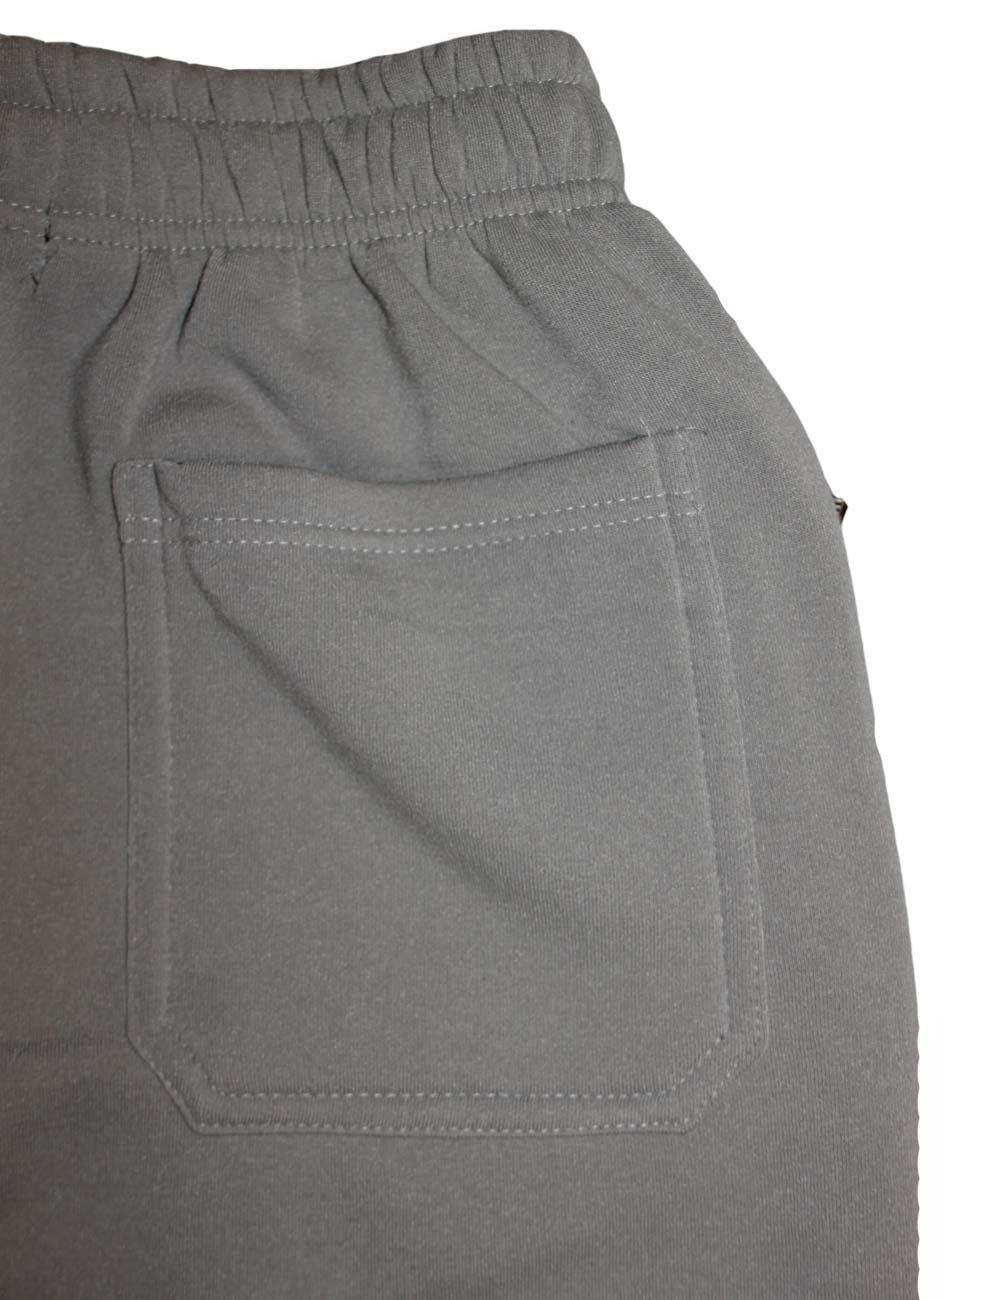 Mens-Women-Plain-Fleece-Joggers-Bottoms-Jogging-Pant-Gym-Fitness-Sports-Trousers thumbnail 35